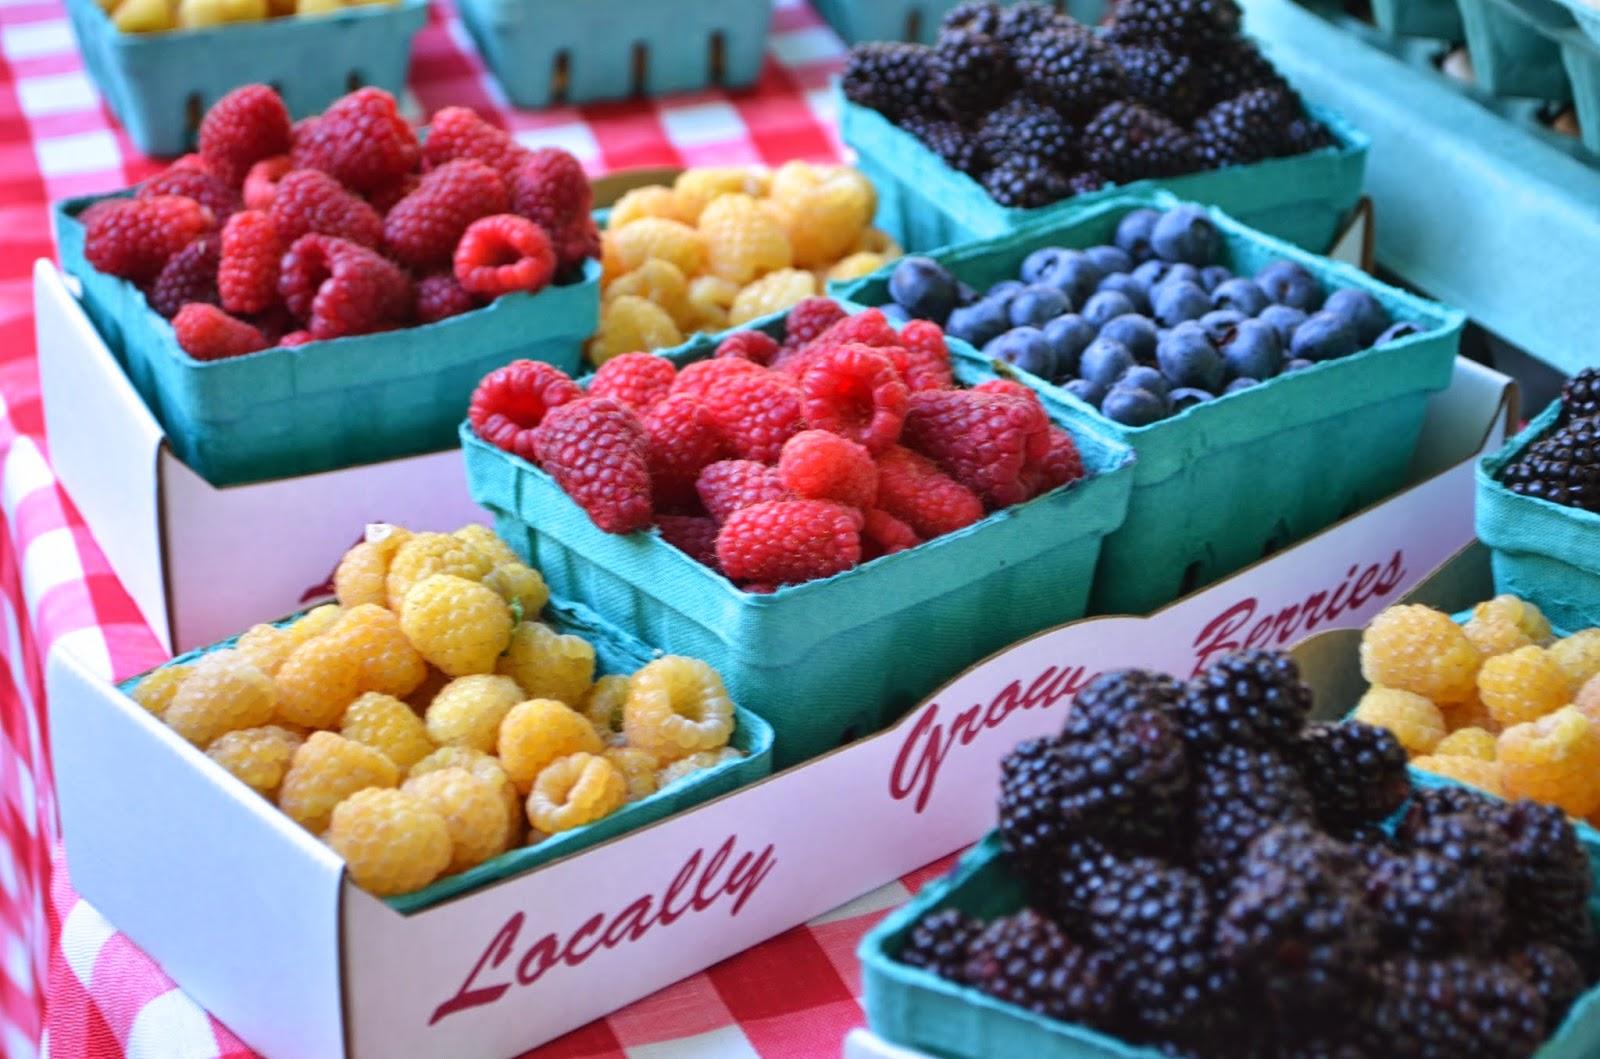 7/15 http://www.findingjoyinallthings.com/2014/07/portland-farmers-market.html